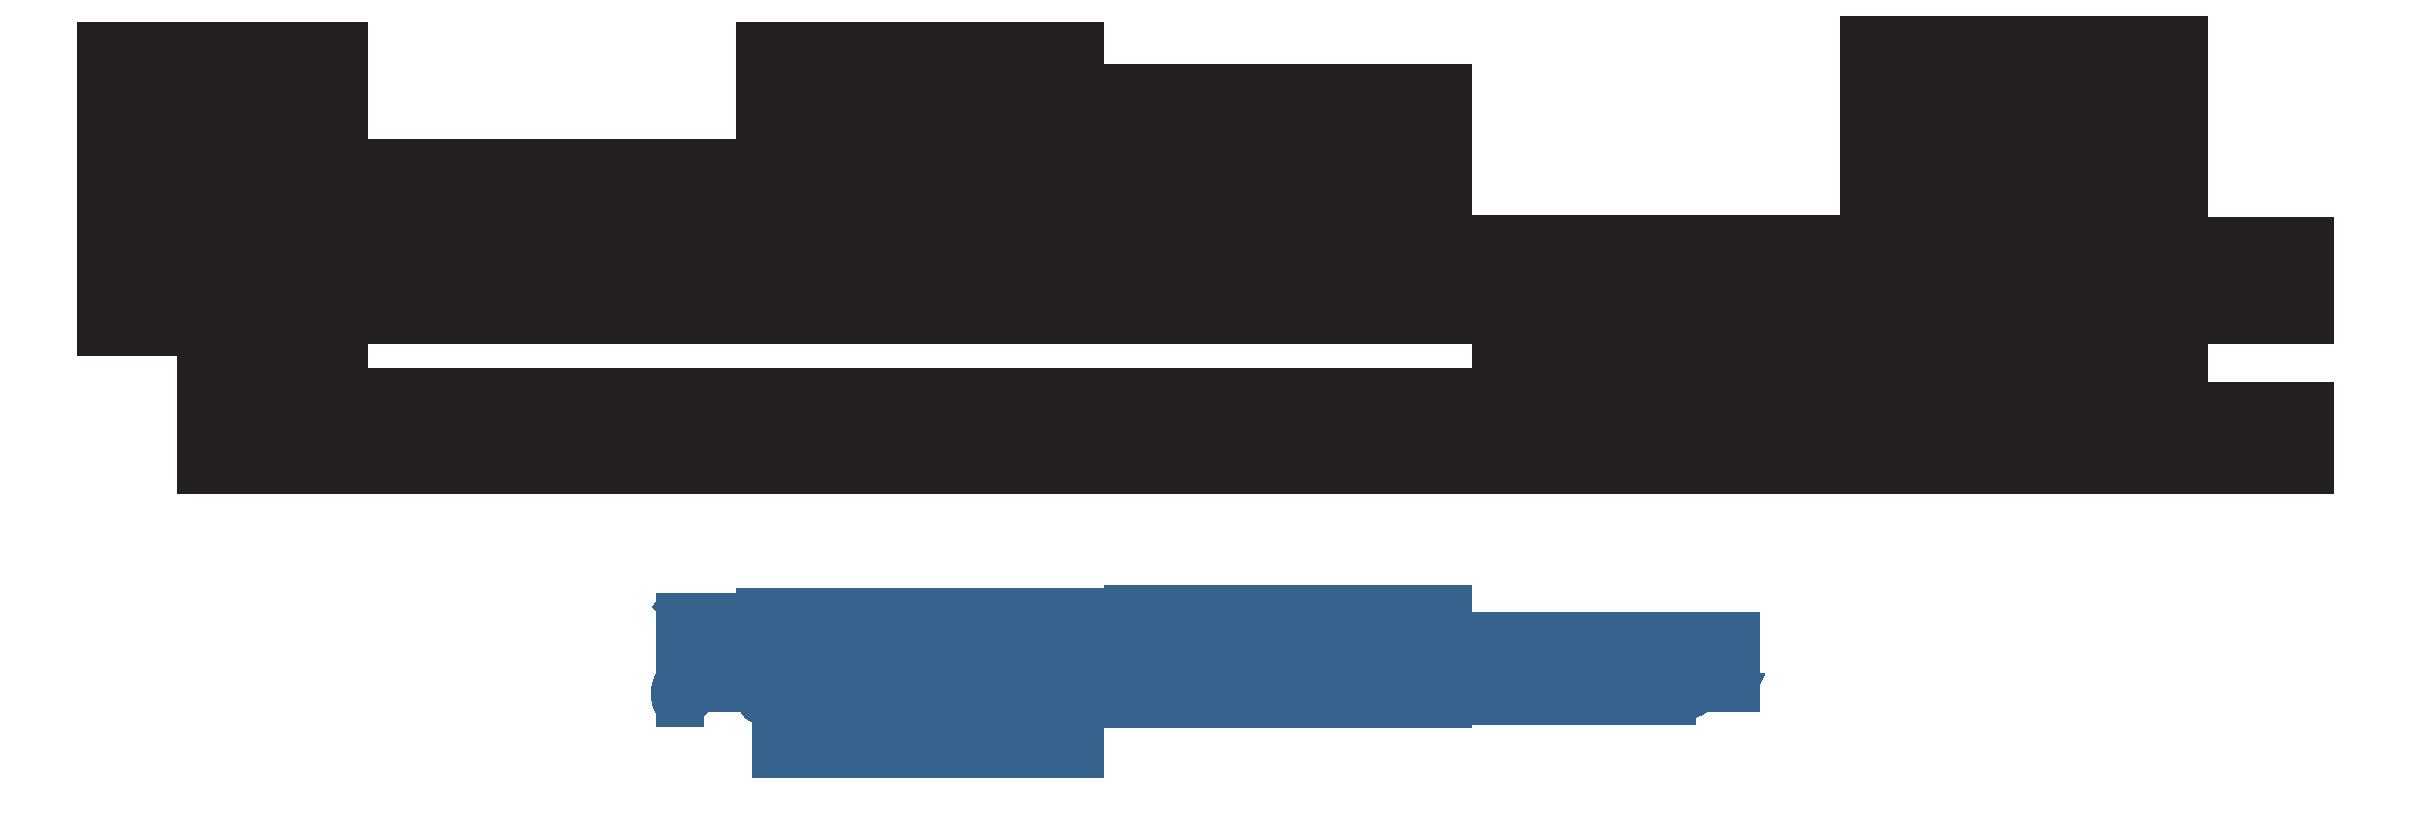 www.alhafez.com